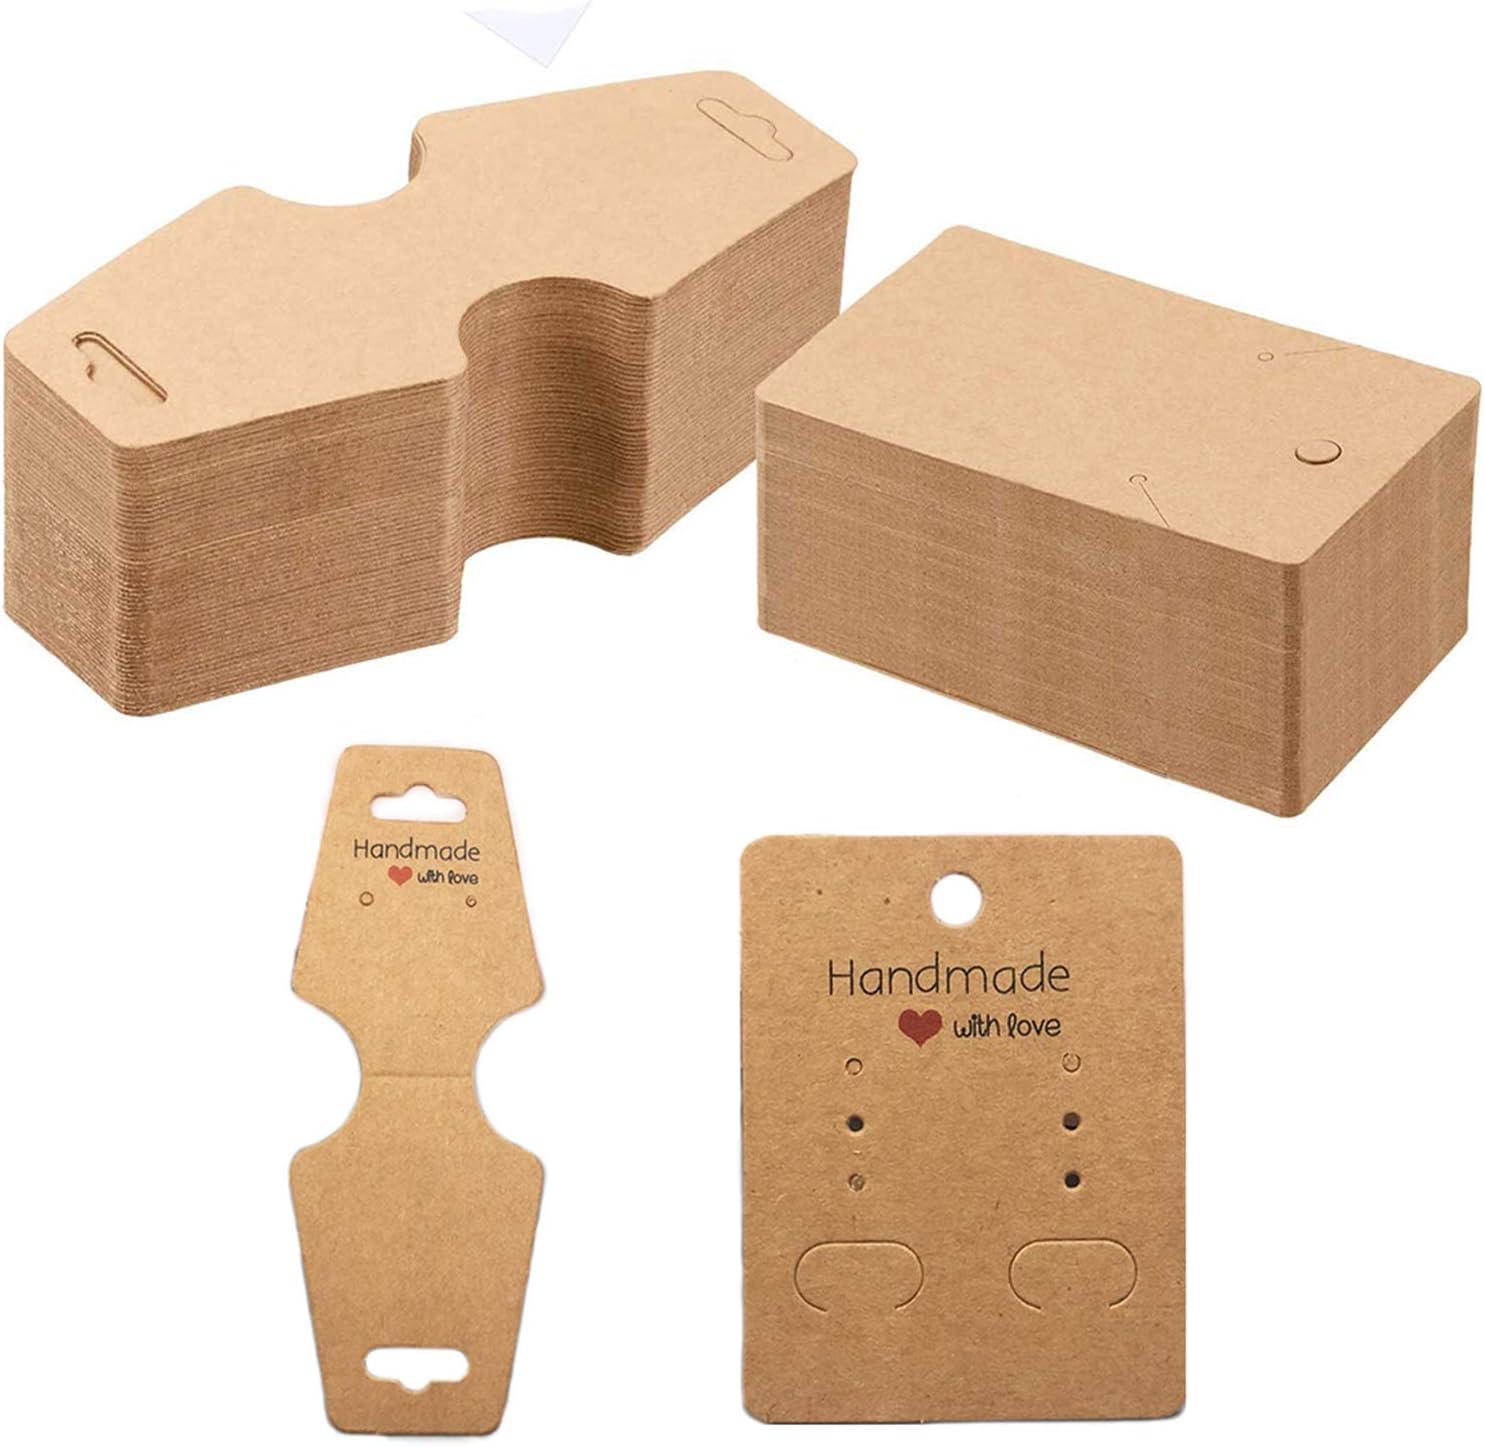 Ohrring-Display-Karten aus Kraftpapier f/ür Ohrstecker Braun Tuparka 120 St/ück Ohrringhalter Karten Halsketten Display Karten mit 120 St/ück Taschen